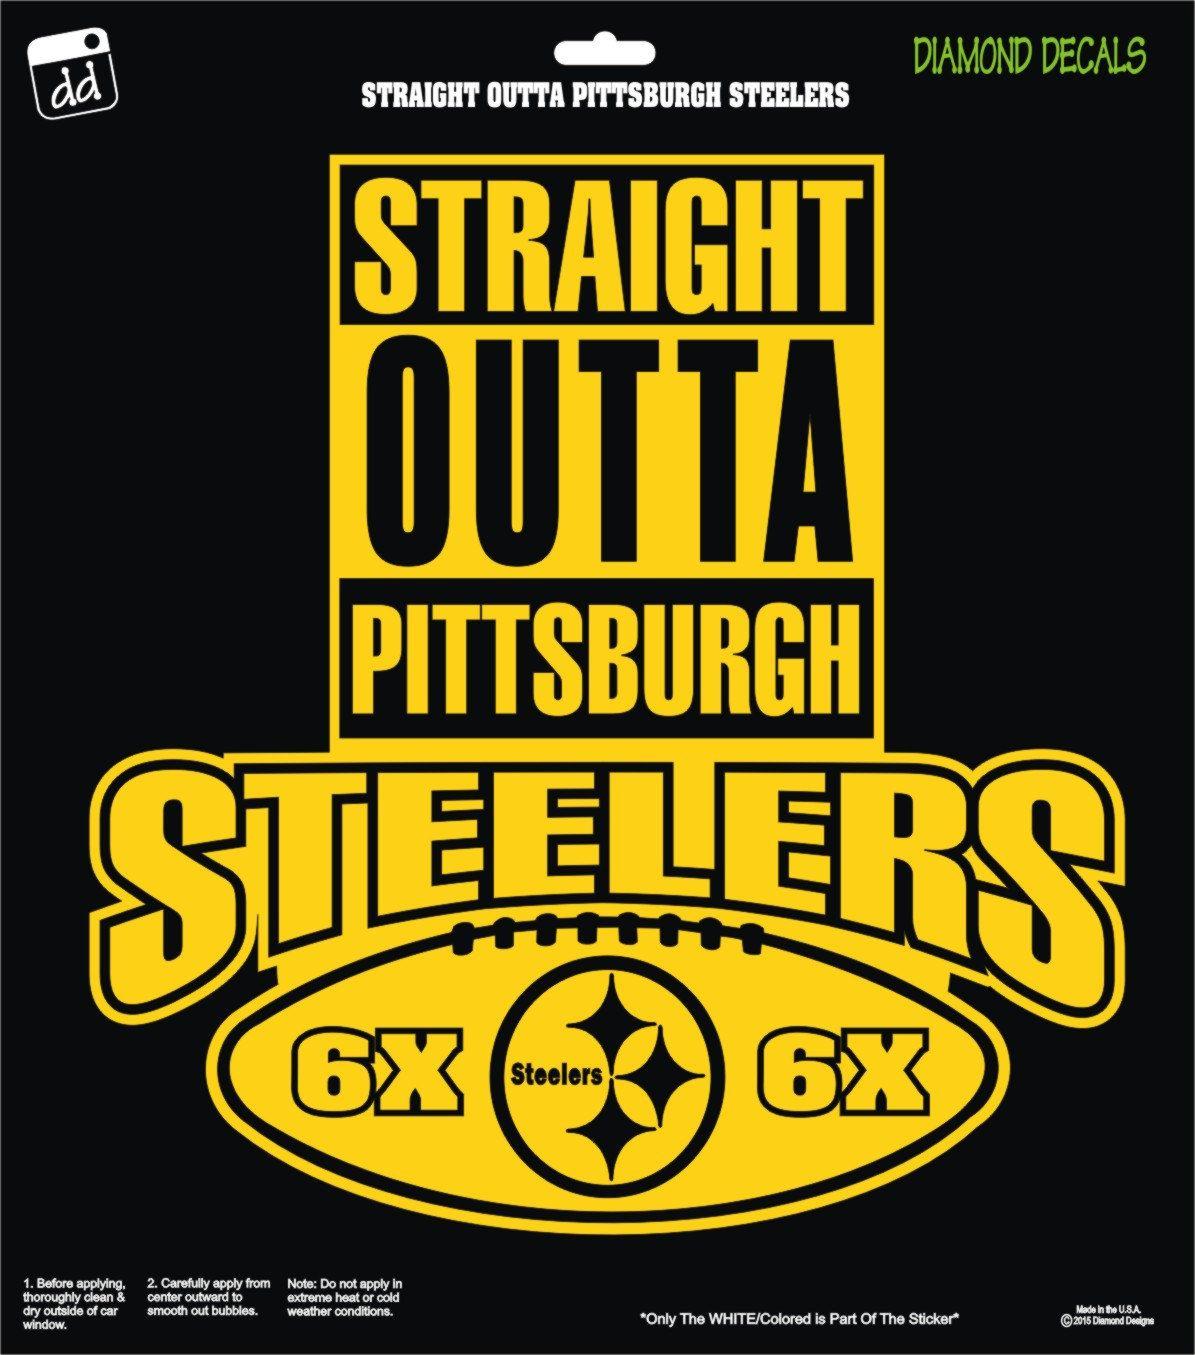 Straight Outta Pittsburgh Steelers Nfl Football Logo Decal Vinyl Sticker Car Truck Window Lapto Pittsburgh Steelers Nfl Football Logos Pittsburgh Steelers Logo [ 1355 x 1195 Pixel ]